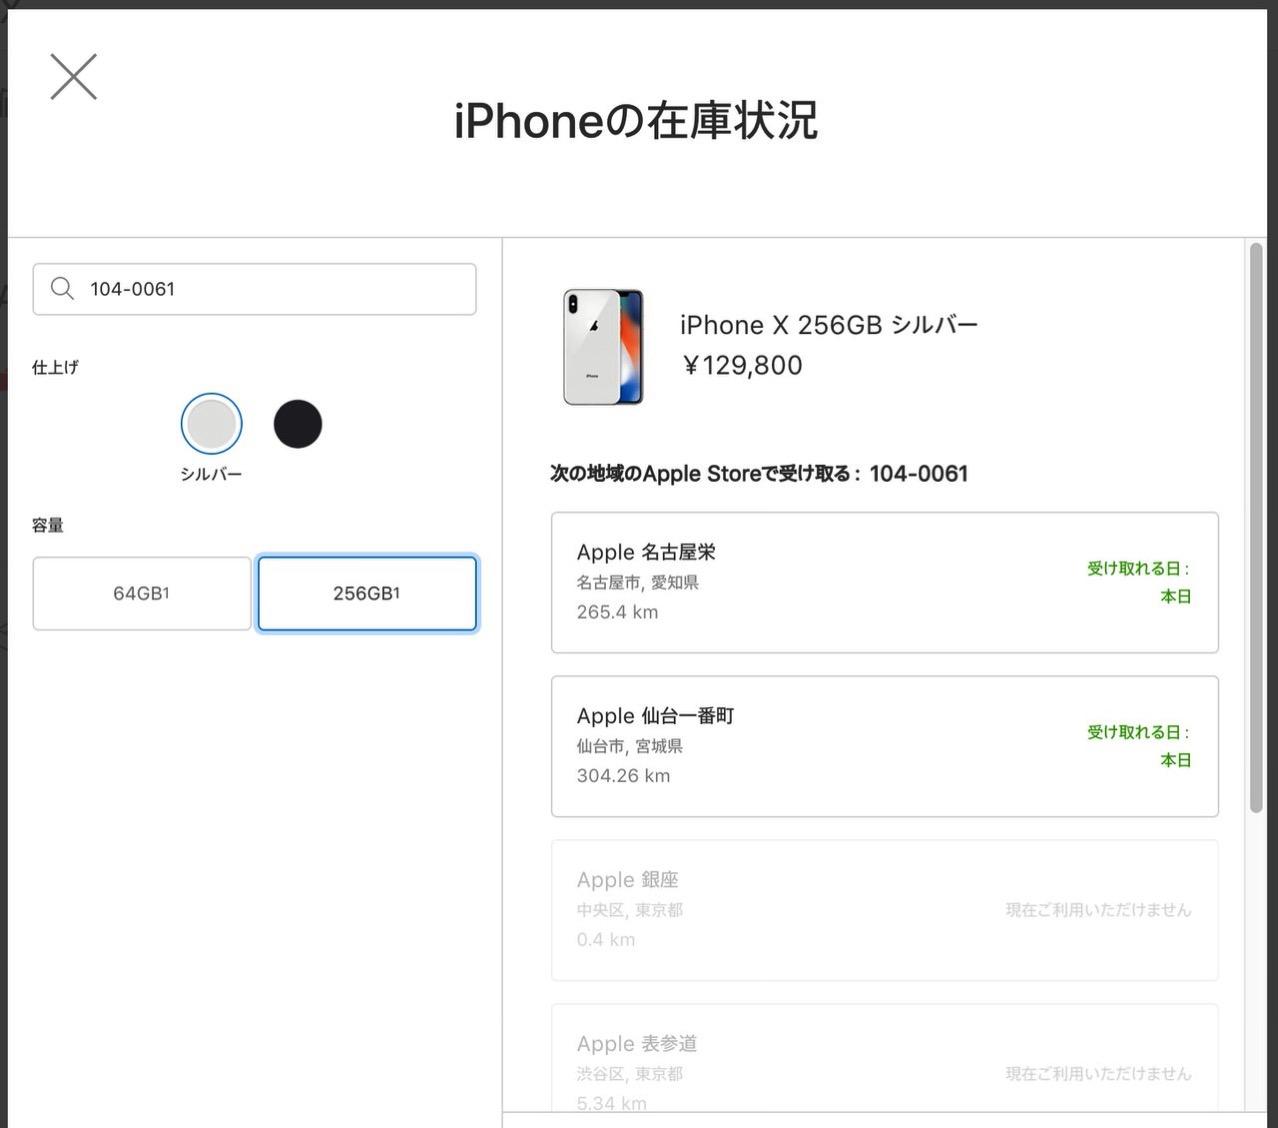 【iPhone X】当日購入可能なApple Storeが増えているようですよ!